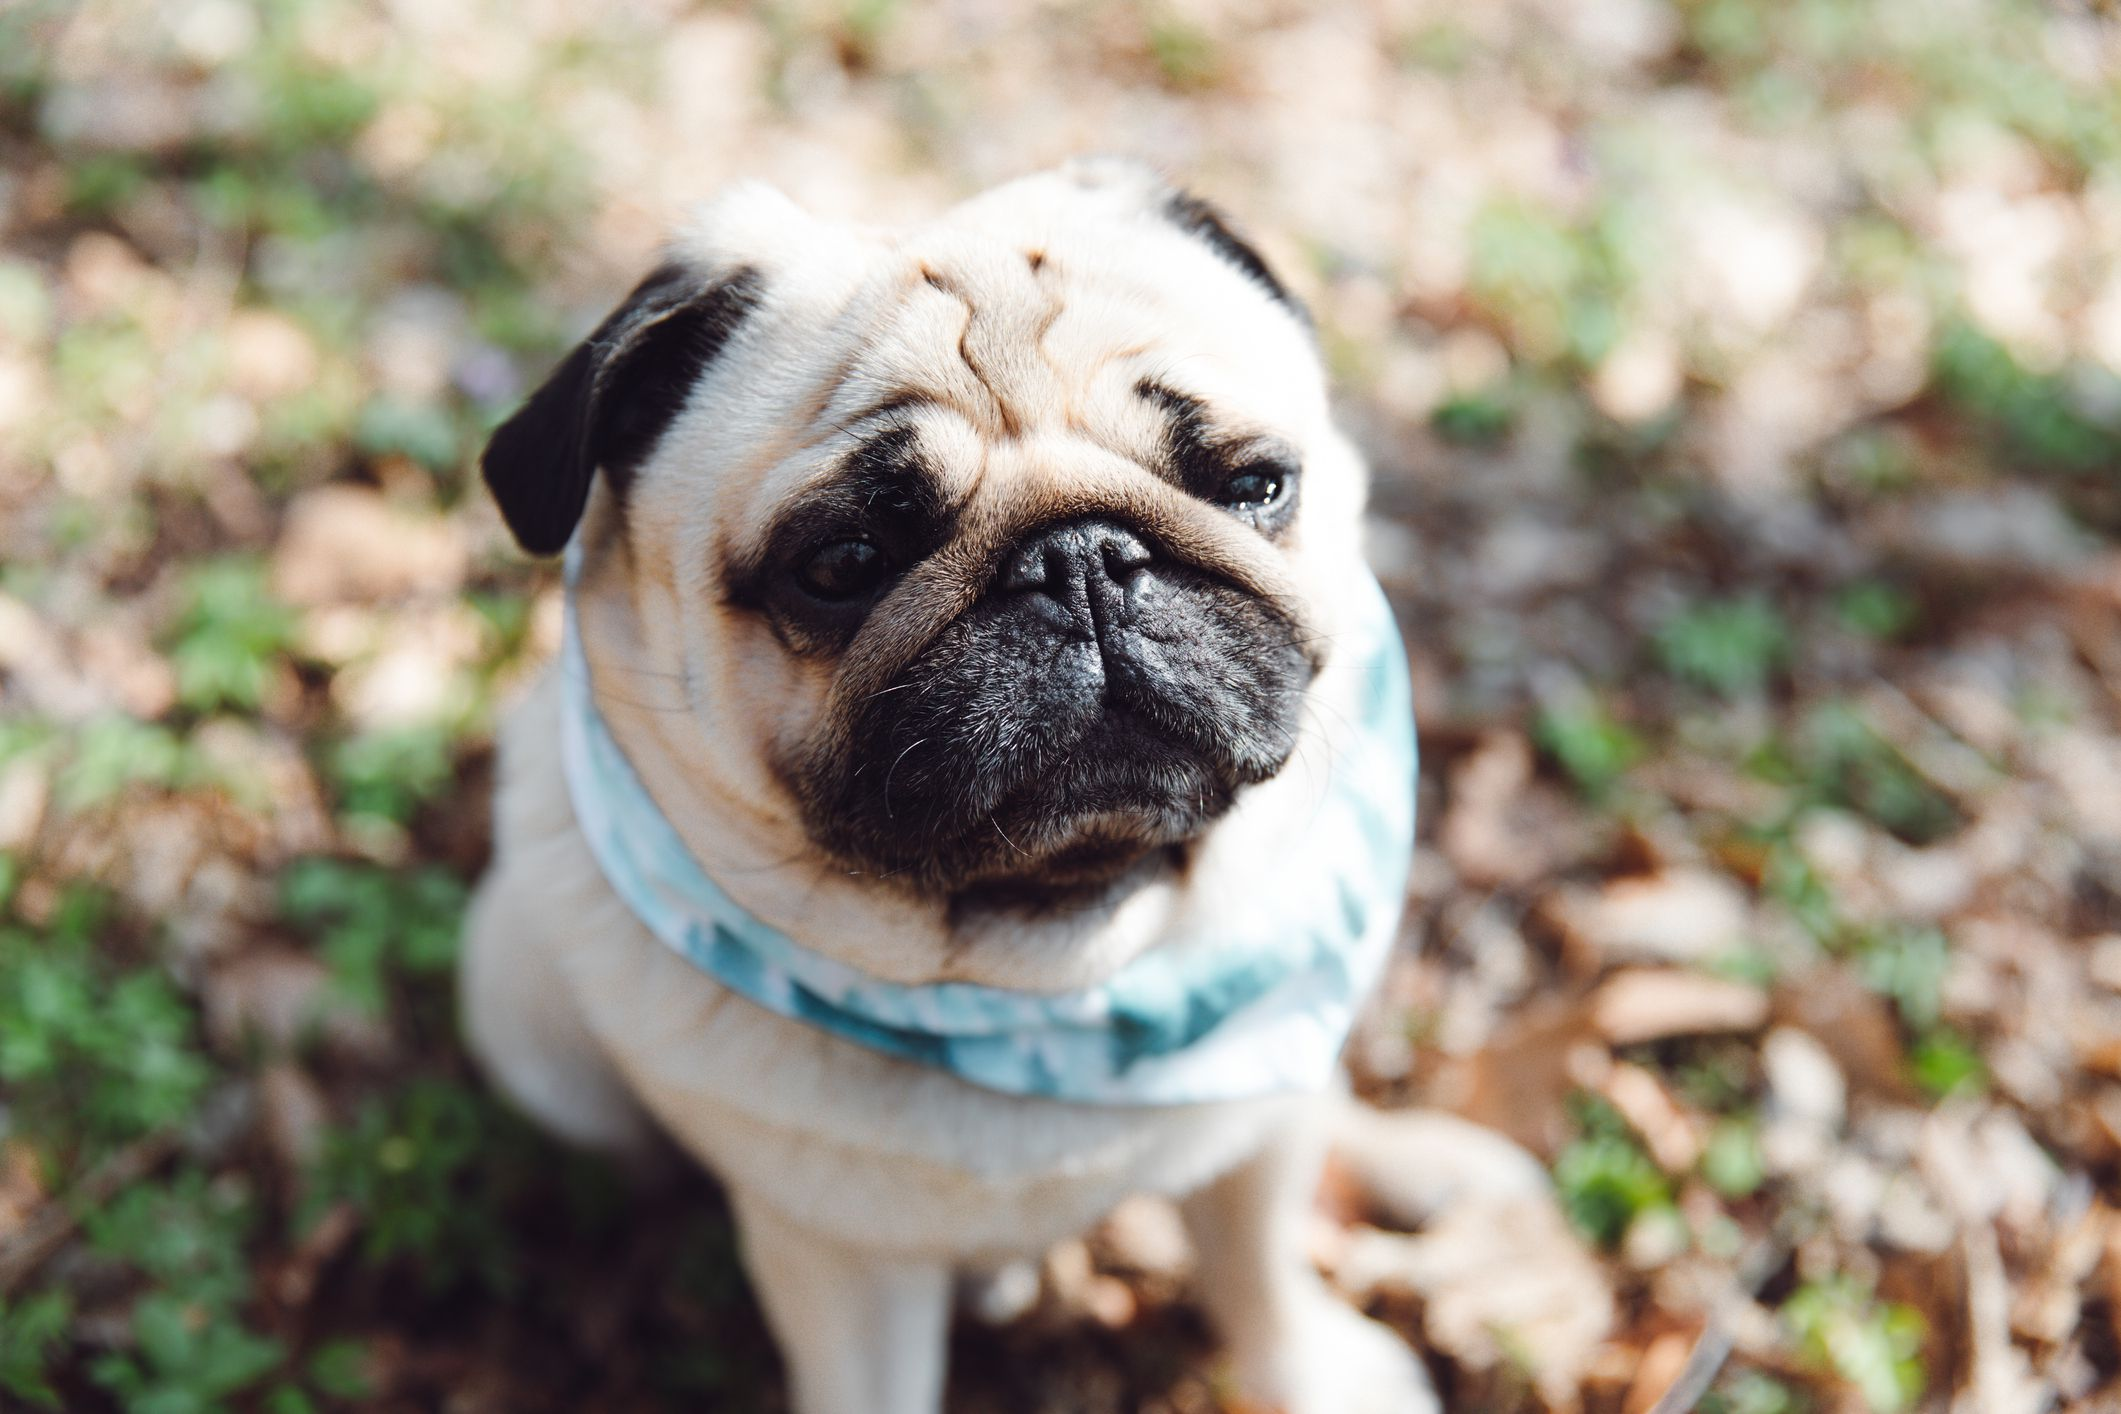 Pug Full Profile History And Care